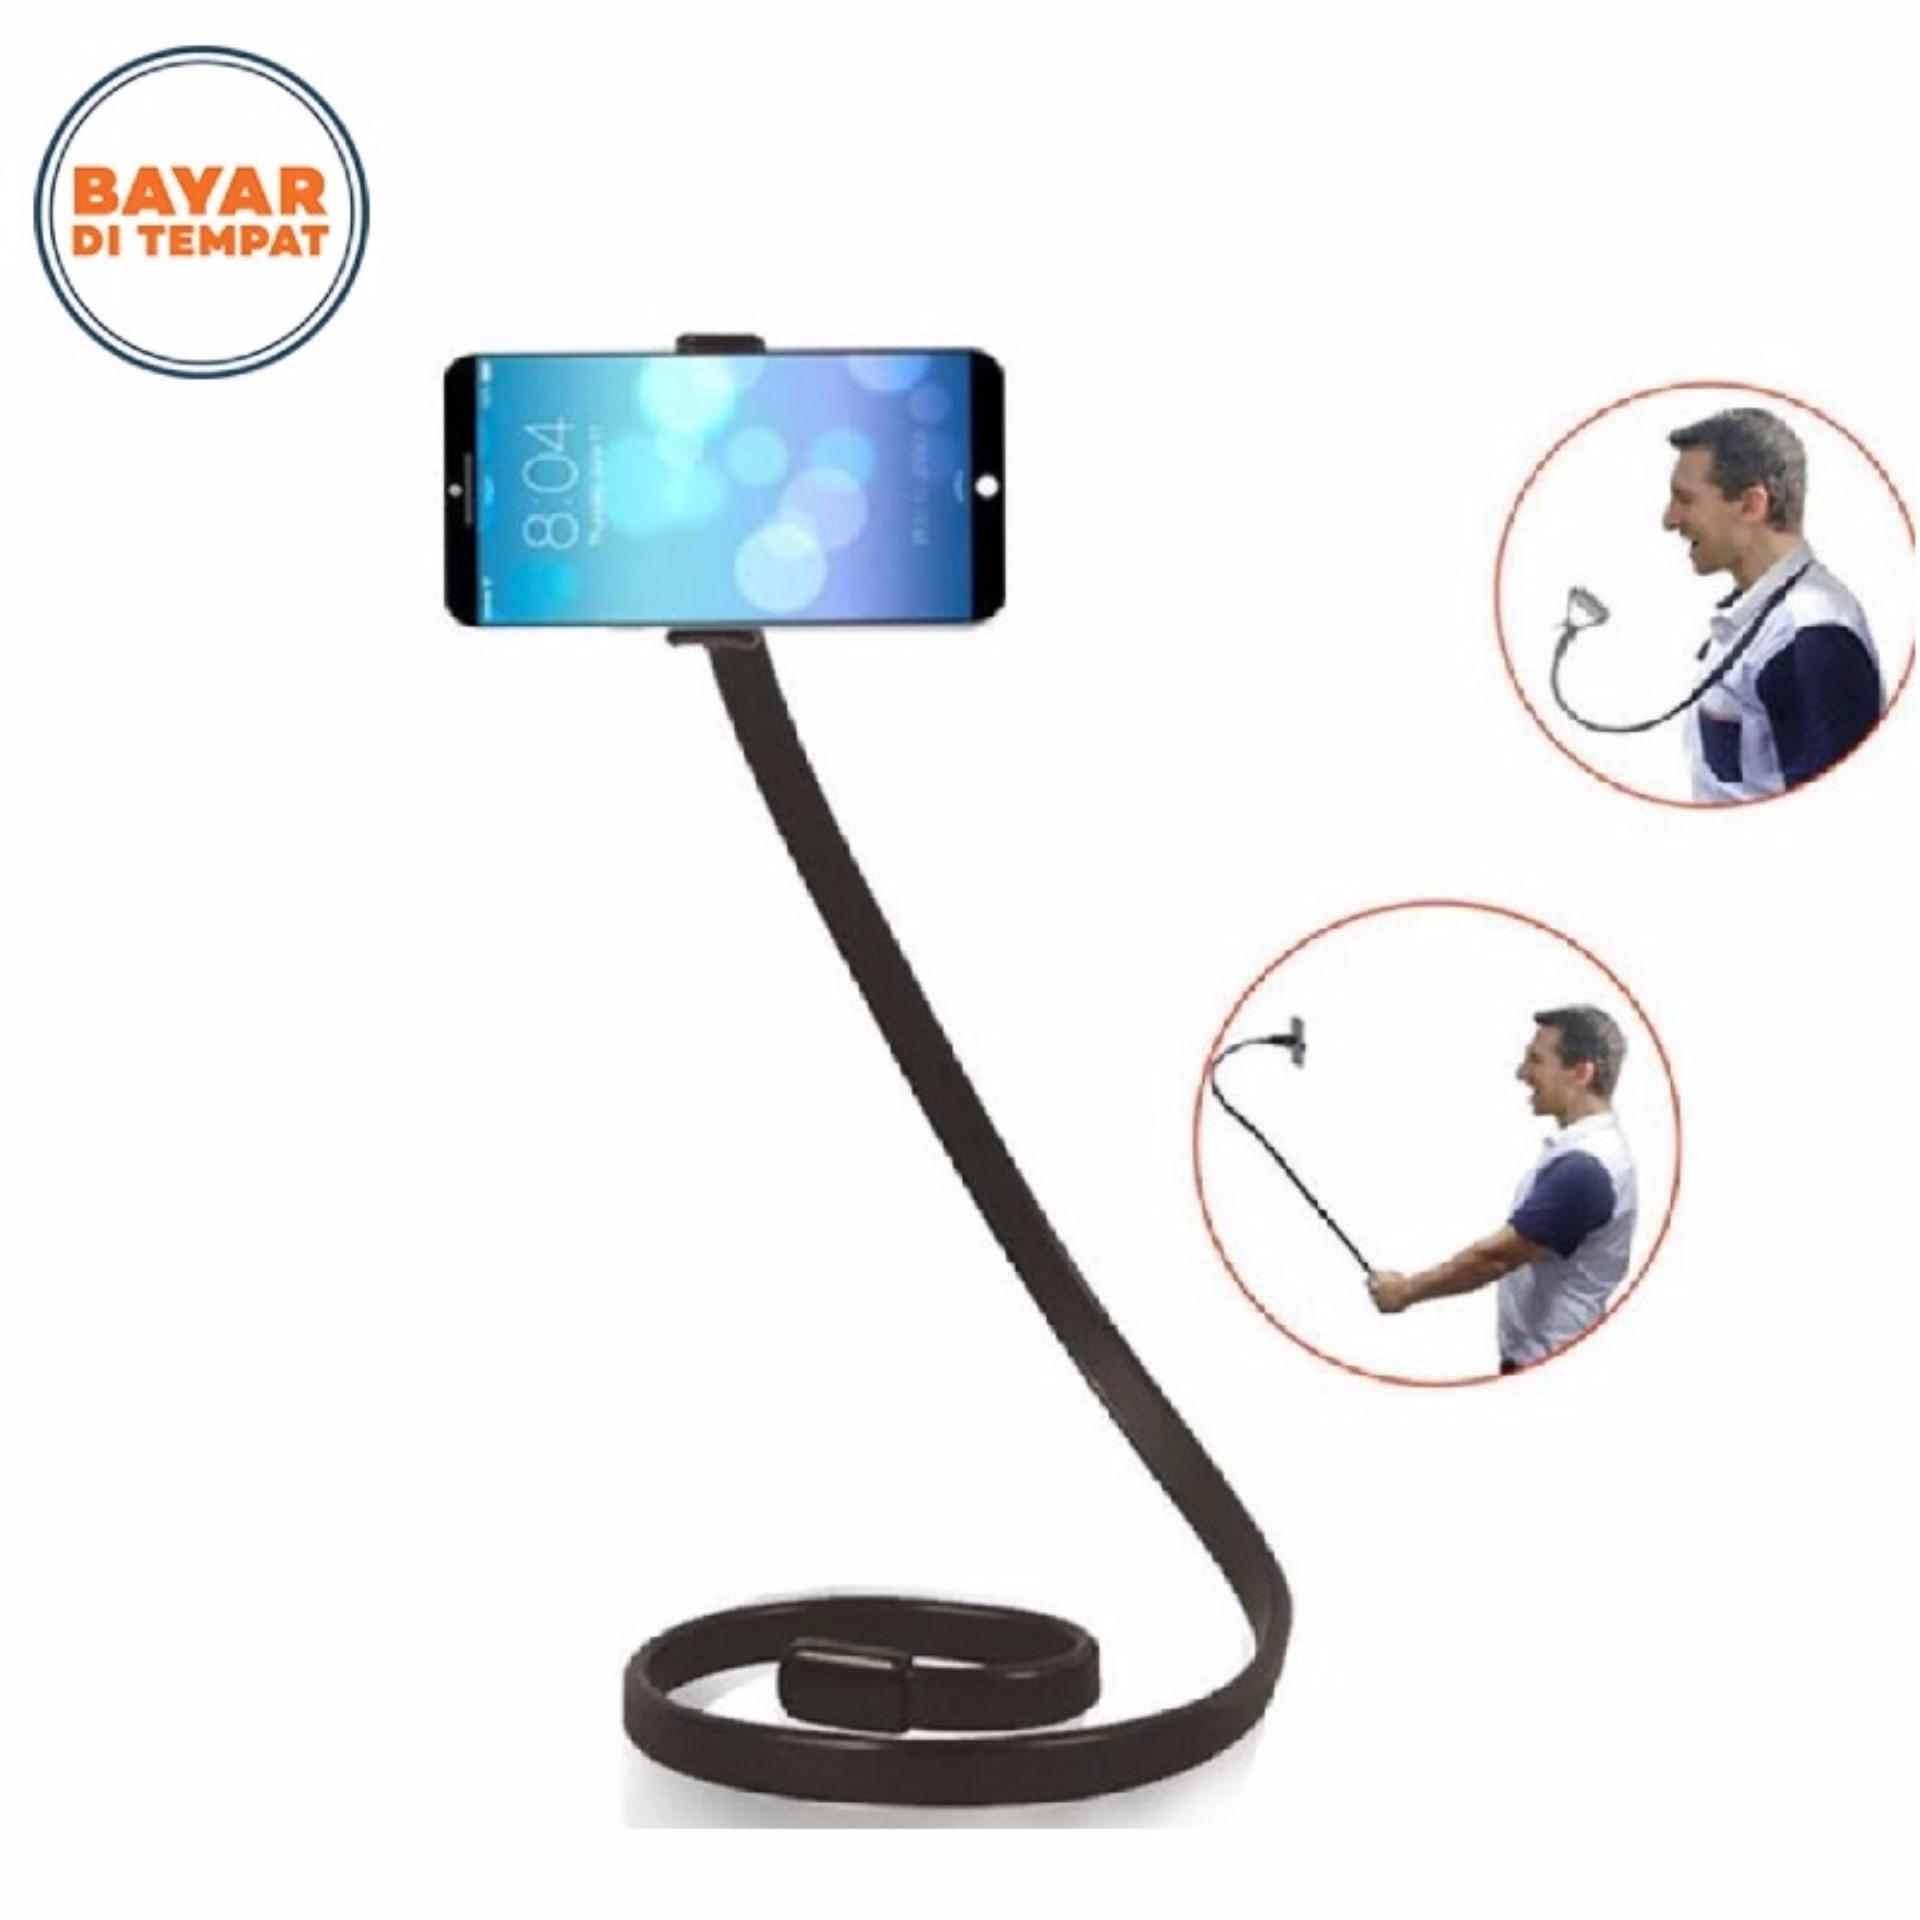 Discount Phoseat Lazypod Flexible Universal Cool Design Rotating Phone Clip Holder 6CM Clamp beli sekarang -